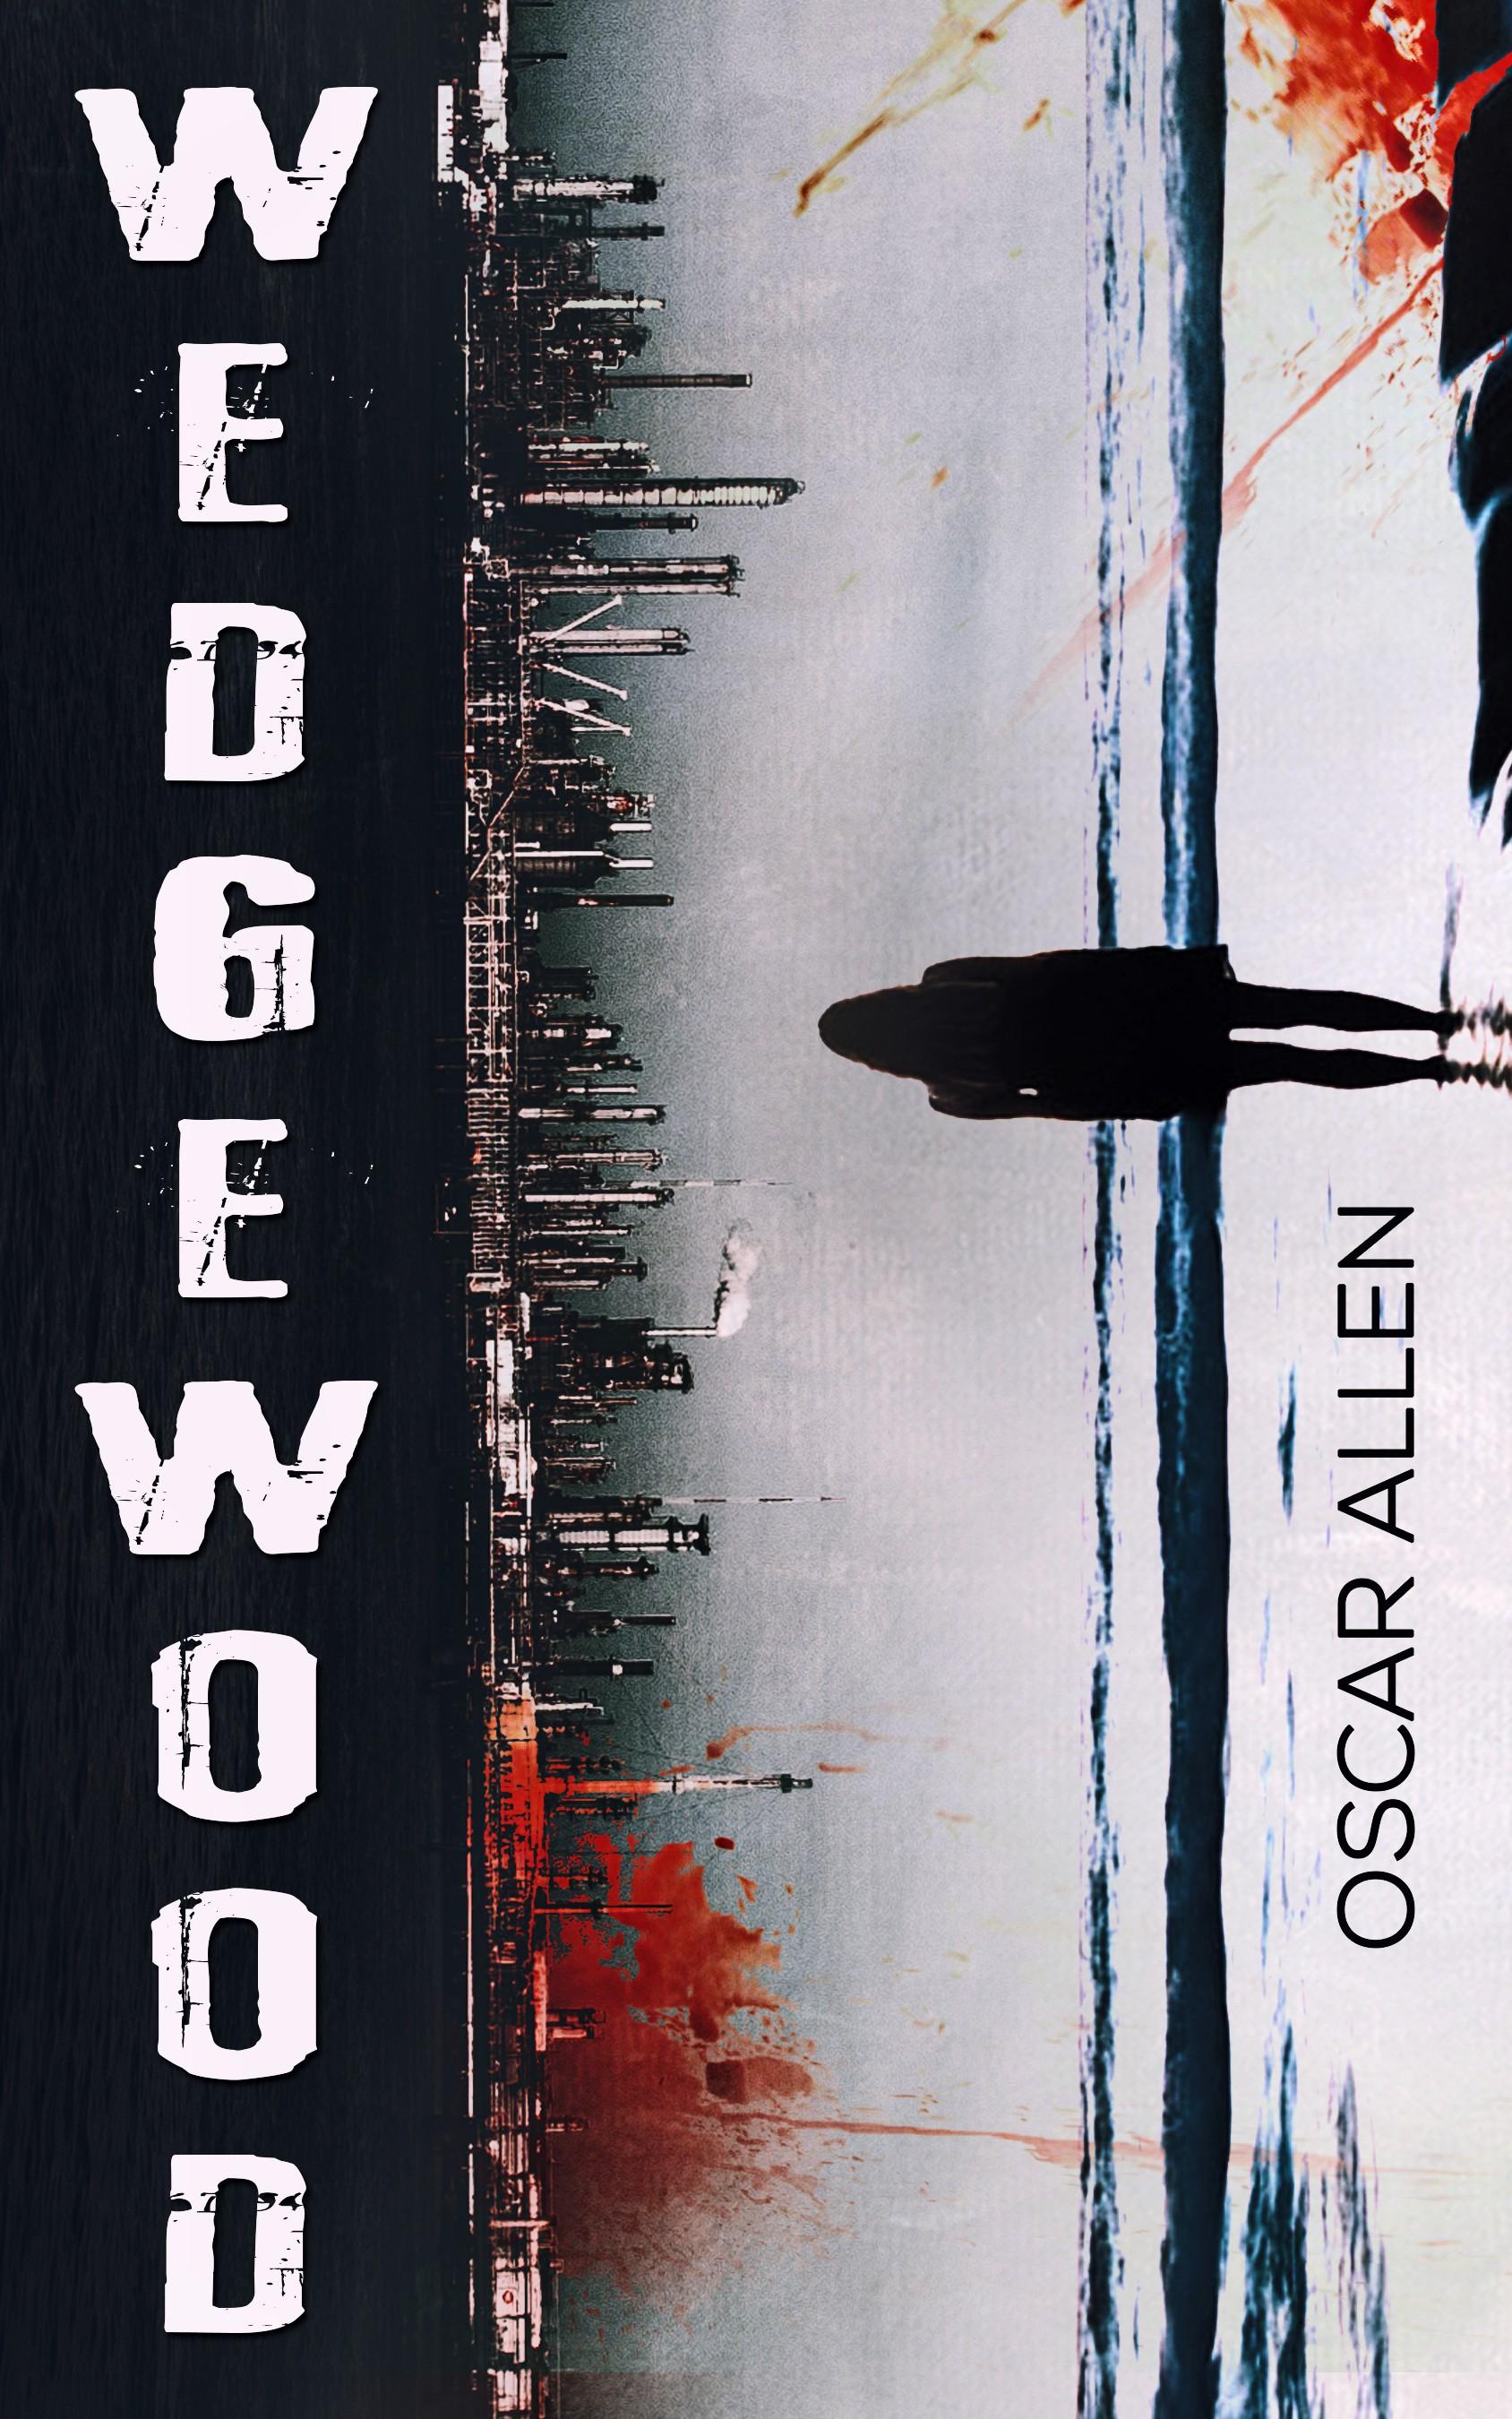 Design an ebook cover for a dark, contemporary fantasy novel